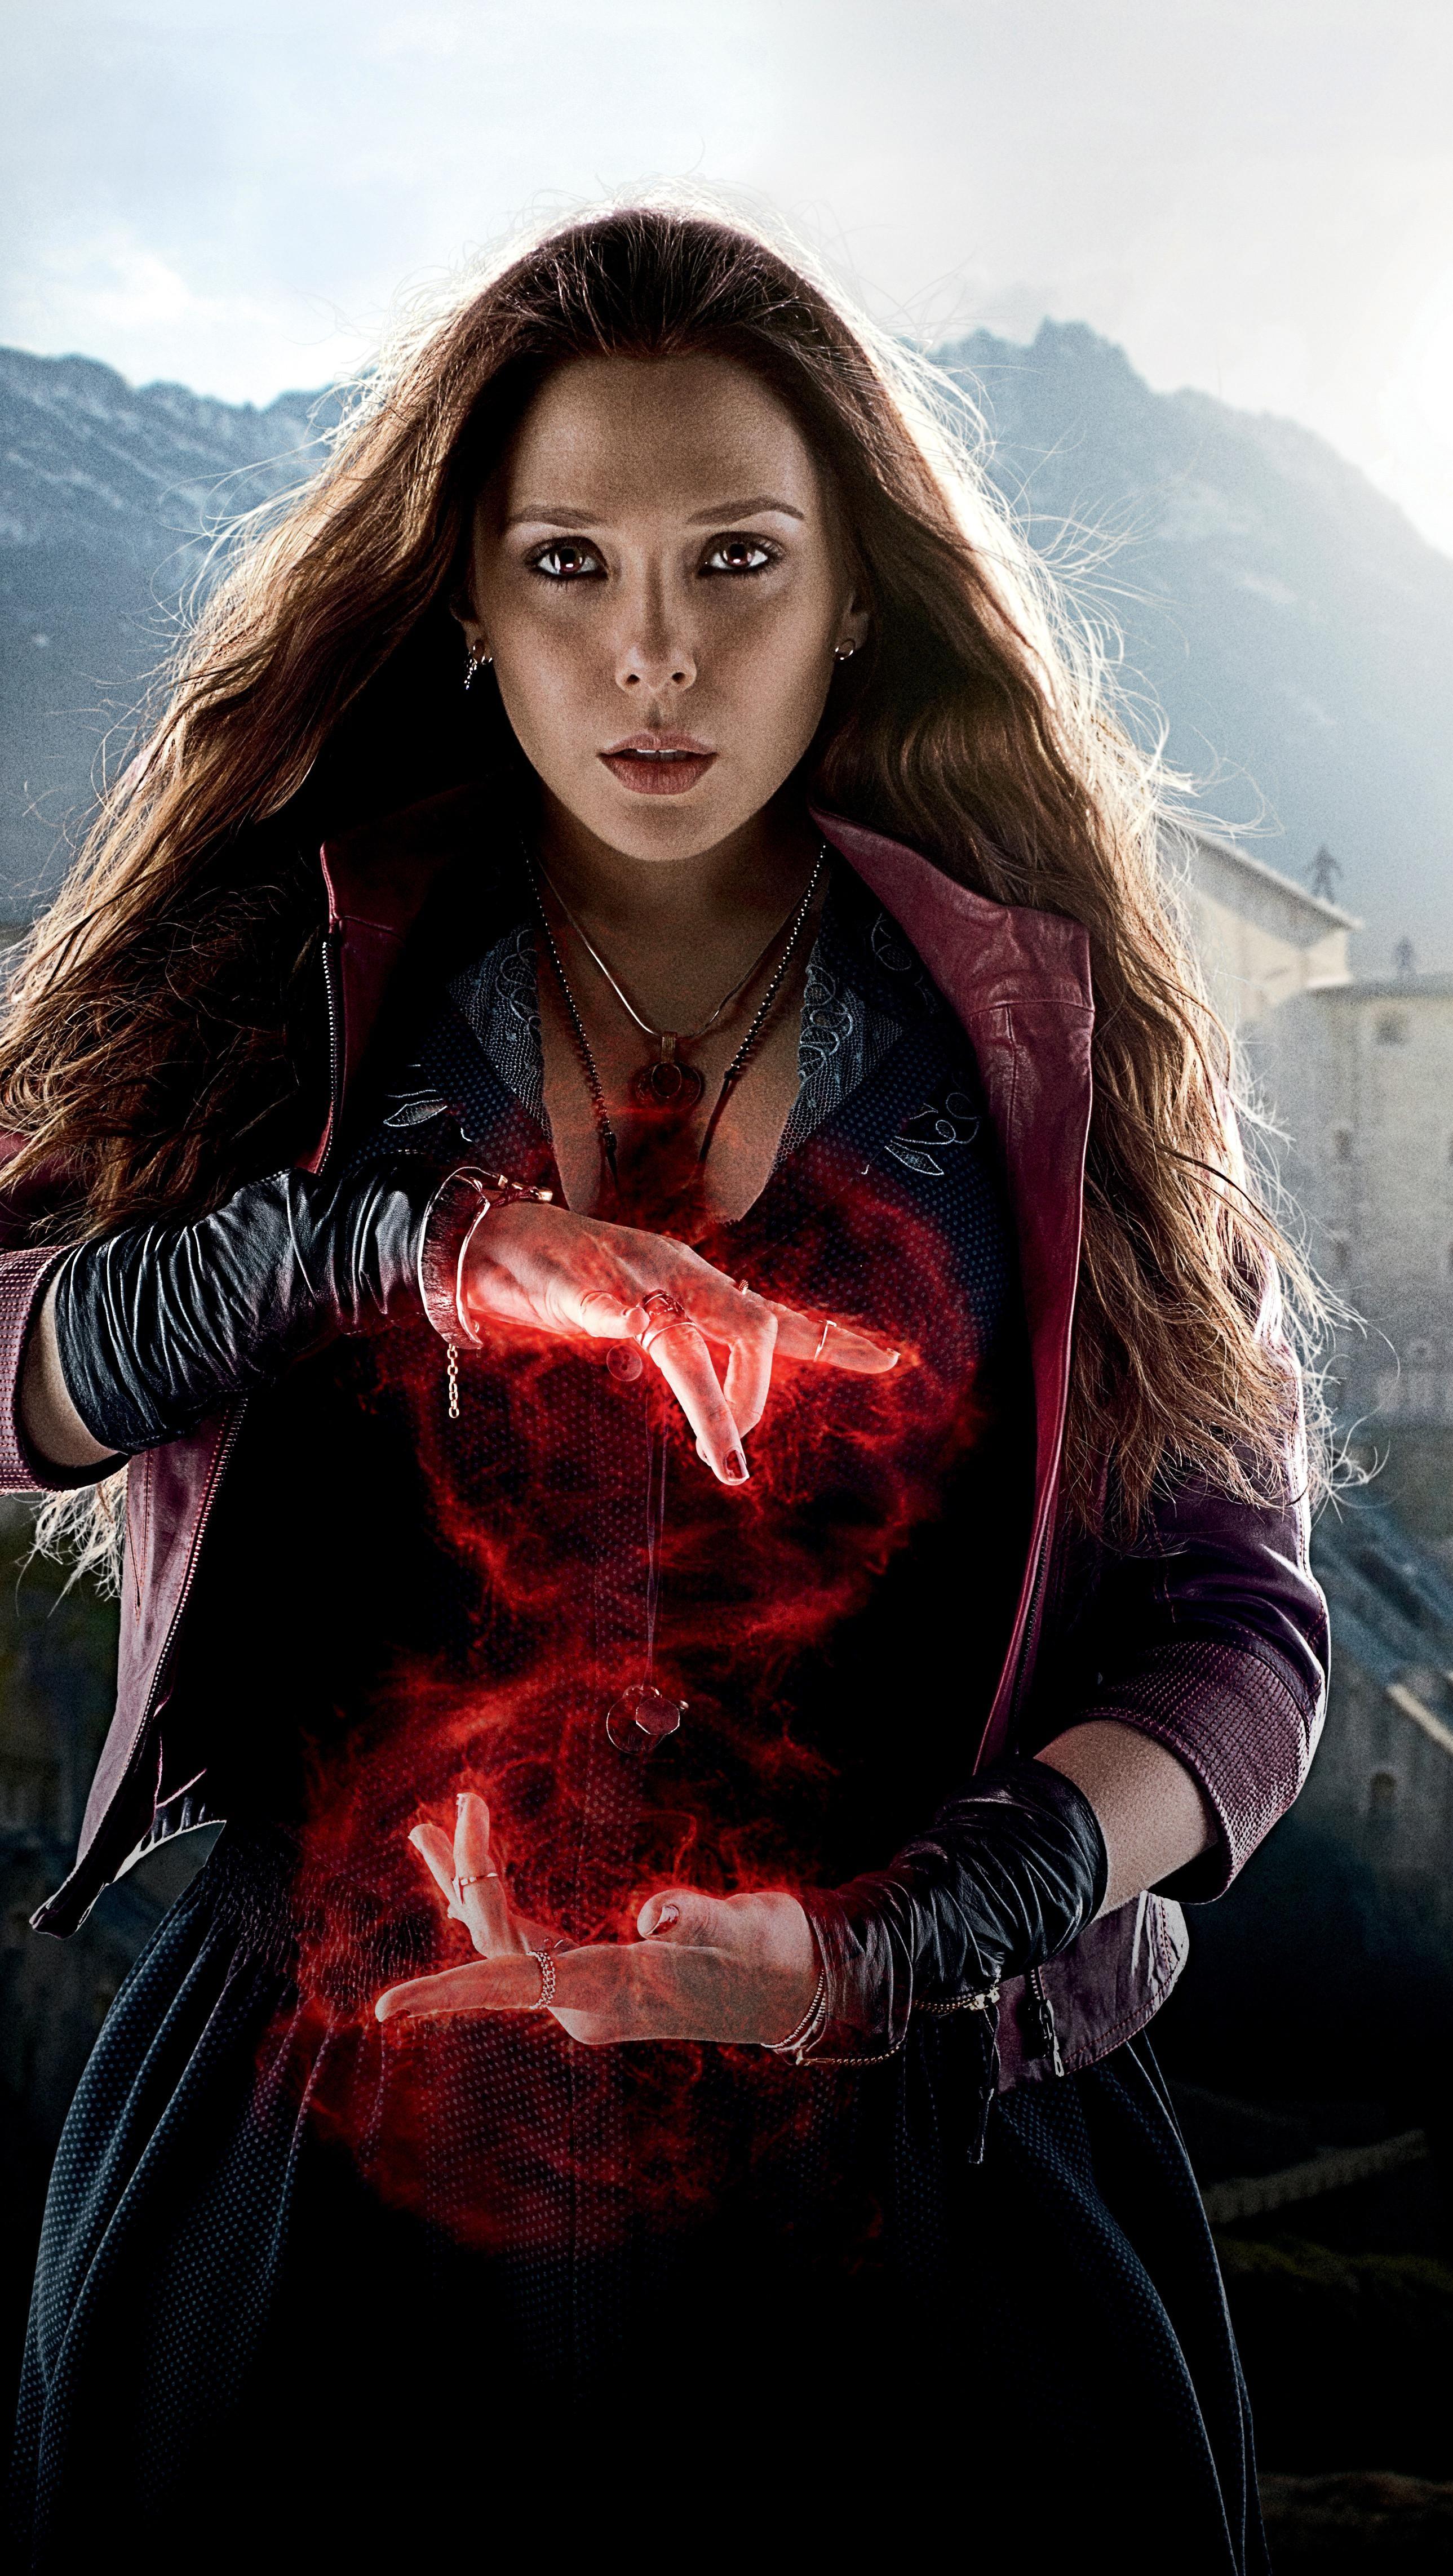 wallpaper : model, red, scarlet witch, the avengers, elizabeth olsen